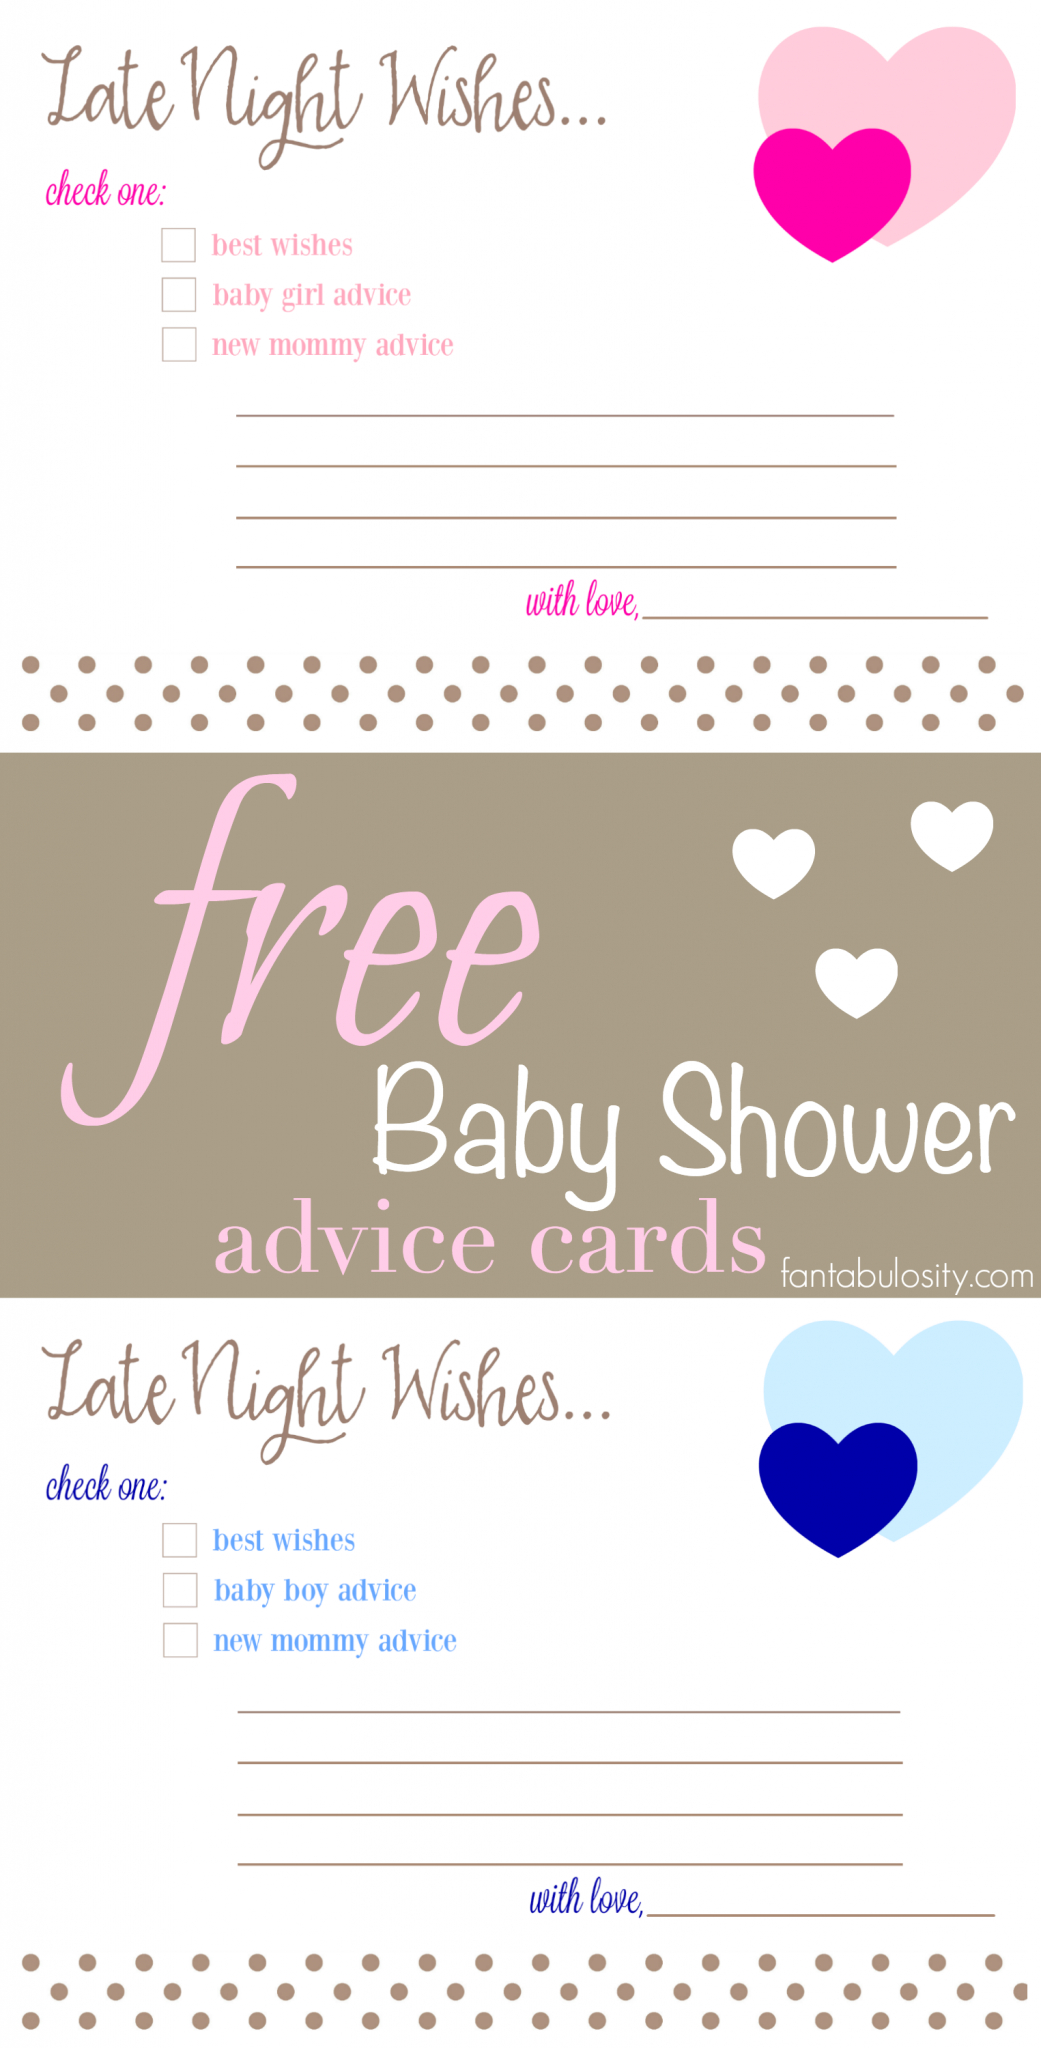 Pinfantabulosity - Life + Style Blog On Best Of Fantabulosity - Free Mommy Advice Cards Printable